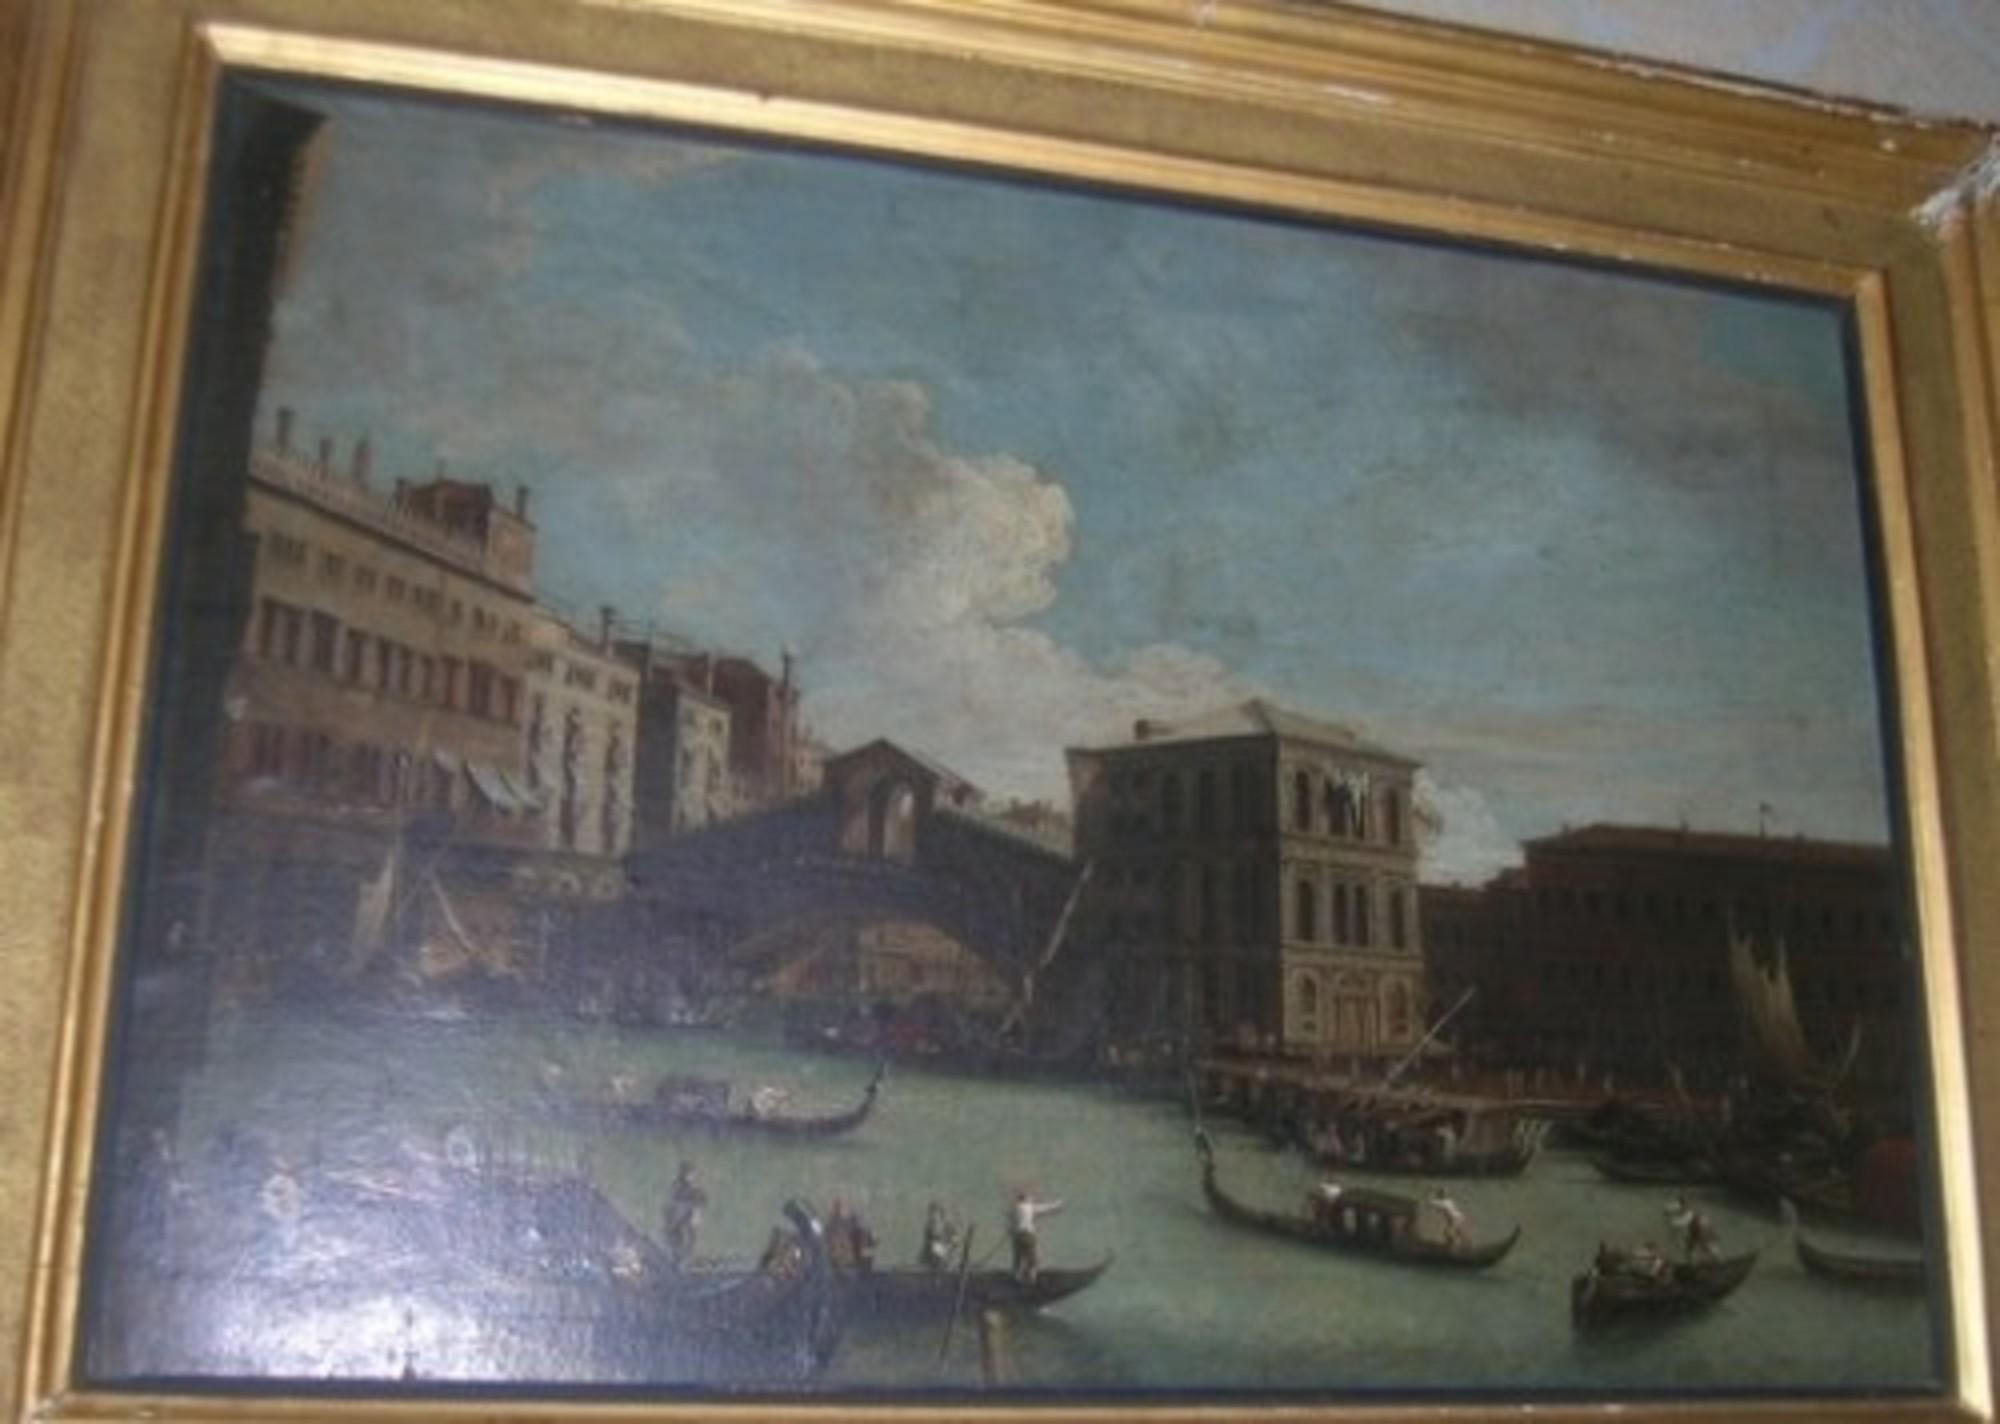 Venice---The-Rialto-Bridge-from-the-north-c.1750-1800-RCIN-400887.jpg